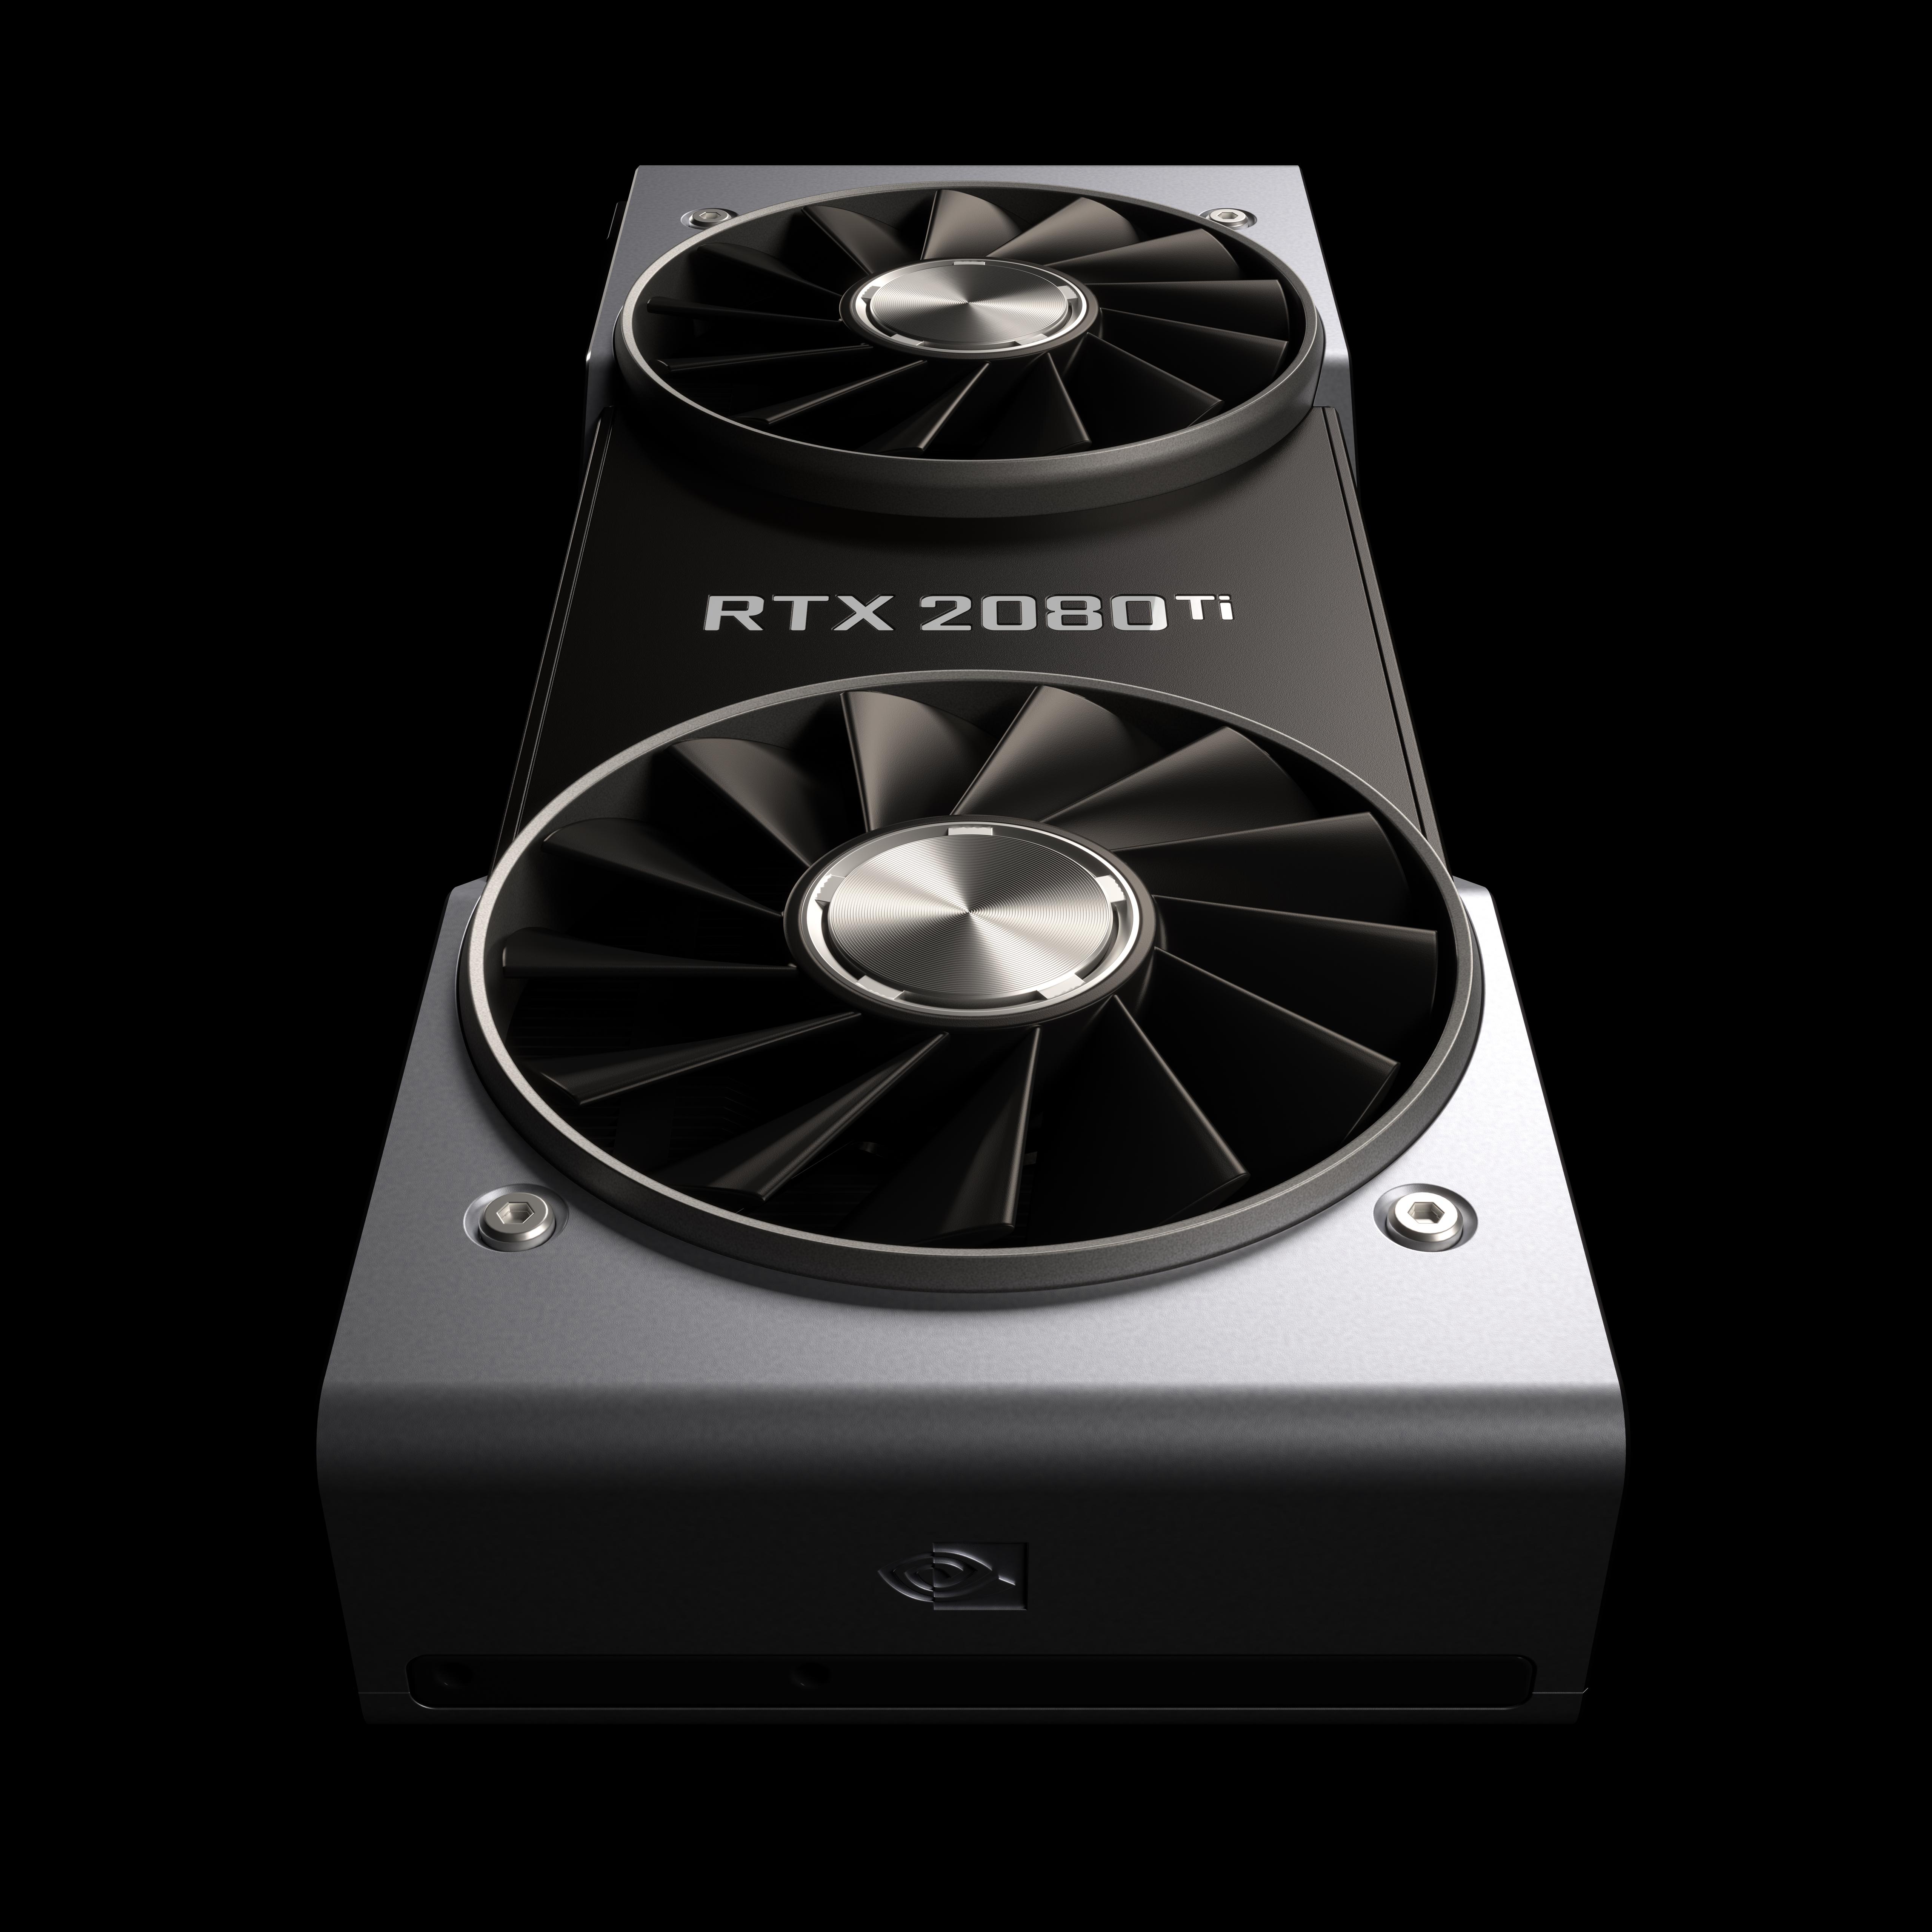 nvidia geforce rtx 2080 ti founders edition cena